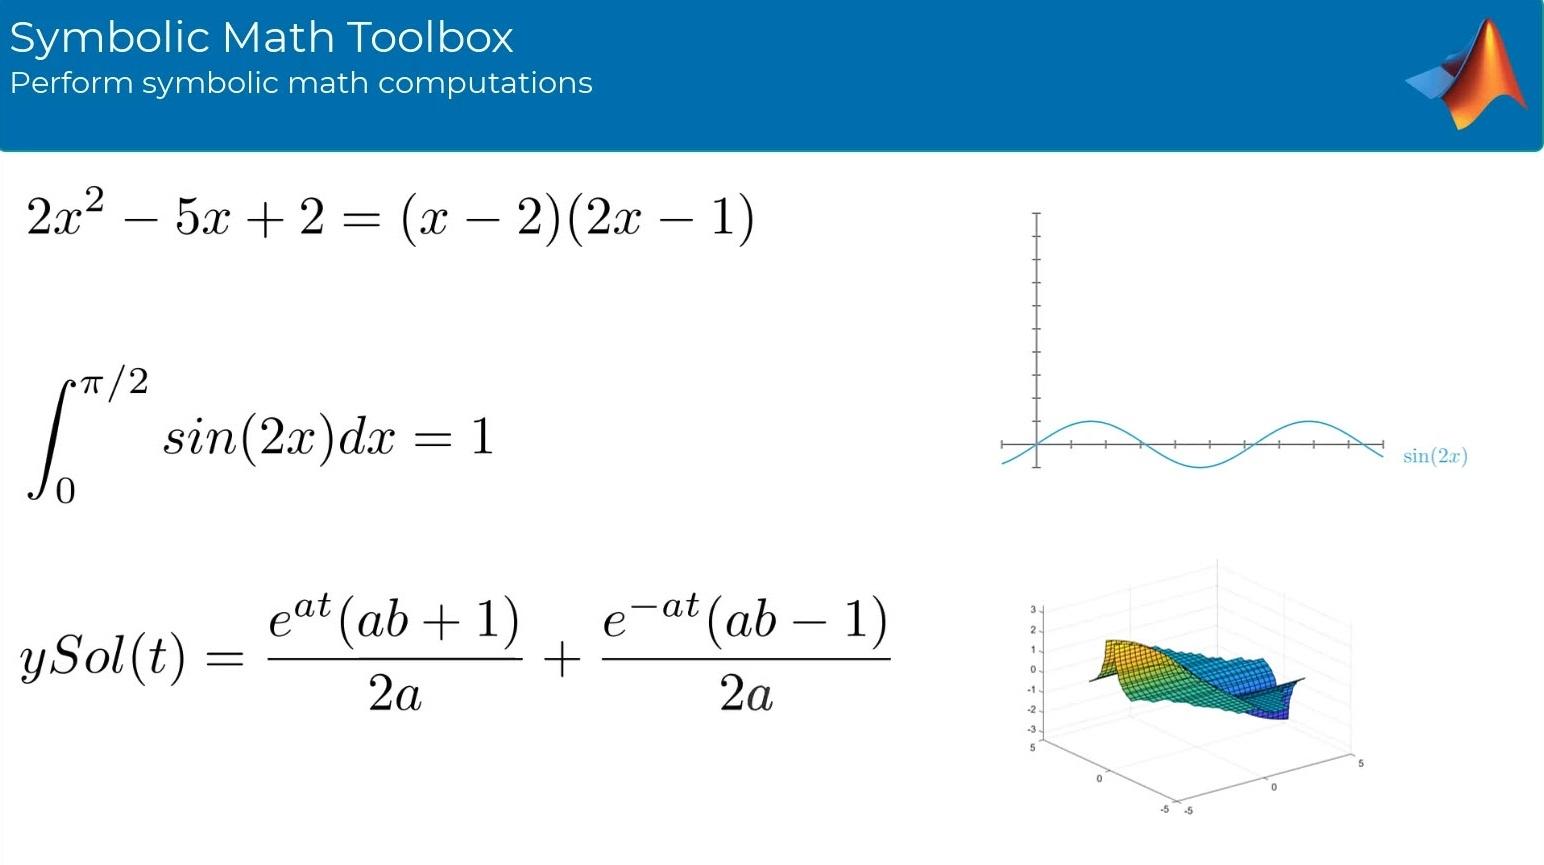 Perform symbolic math computations using Symbolic Math Toolbox™. The toolbox provides functions for solving, plotting, and manipulating symbolic math equations.